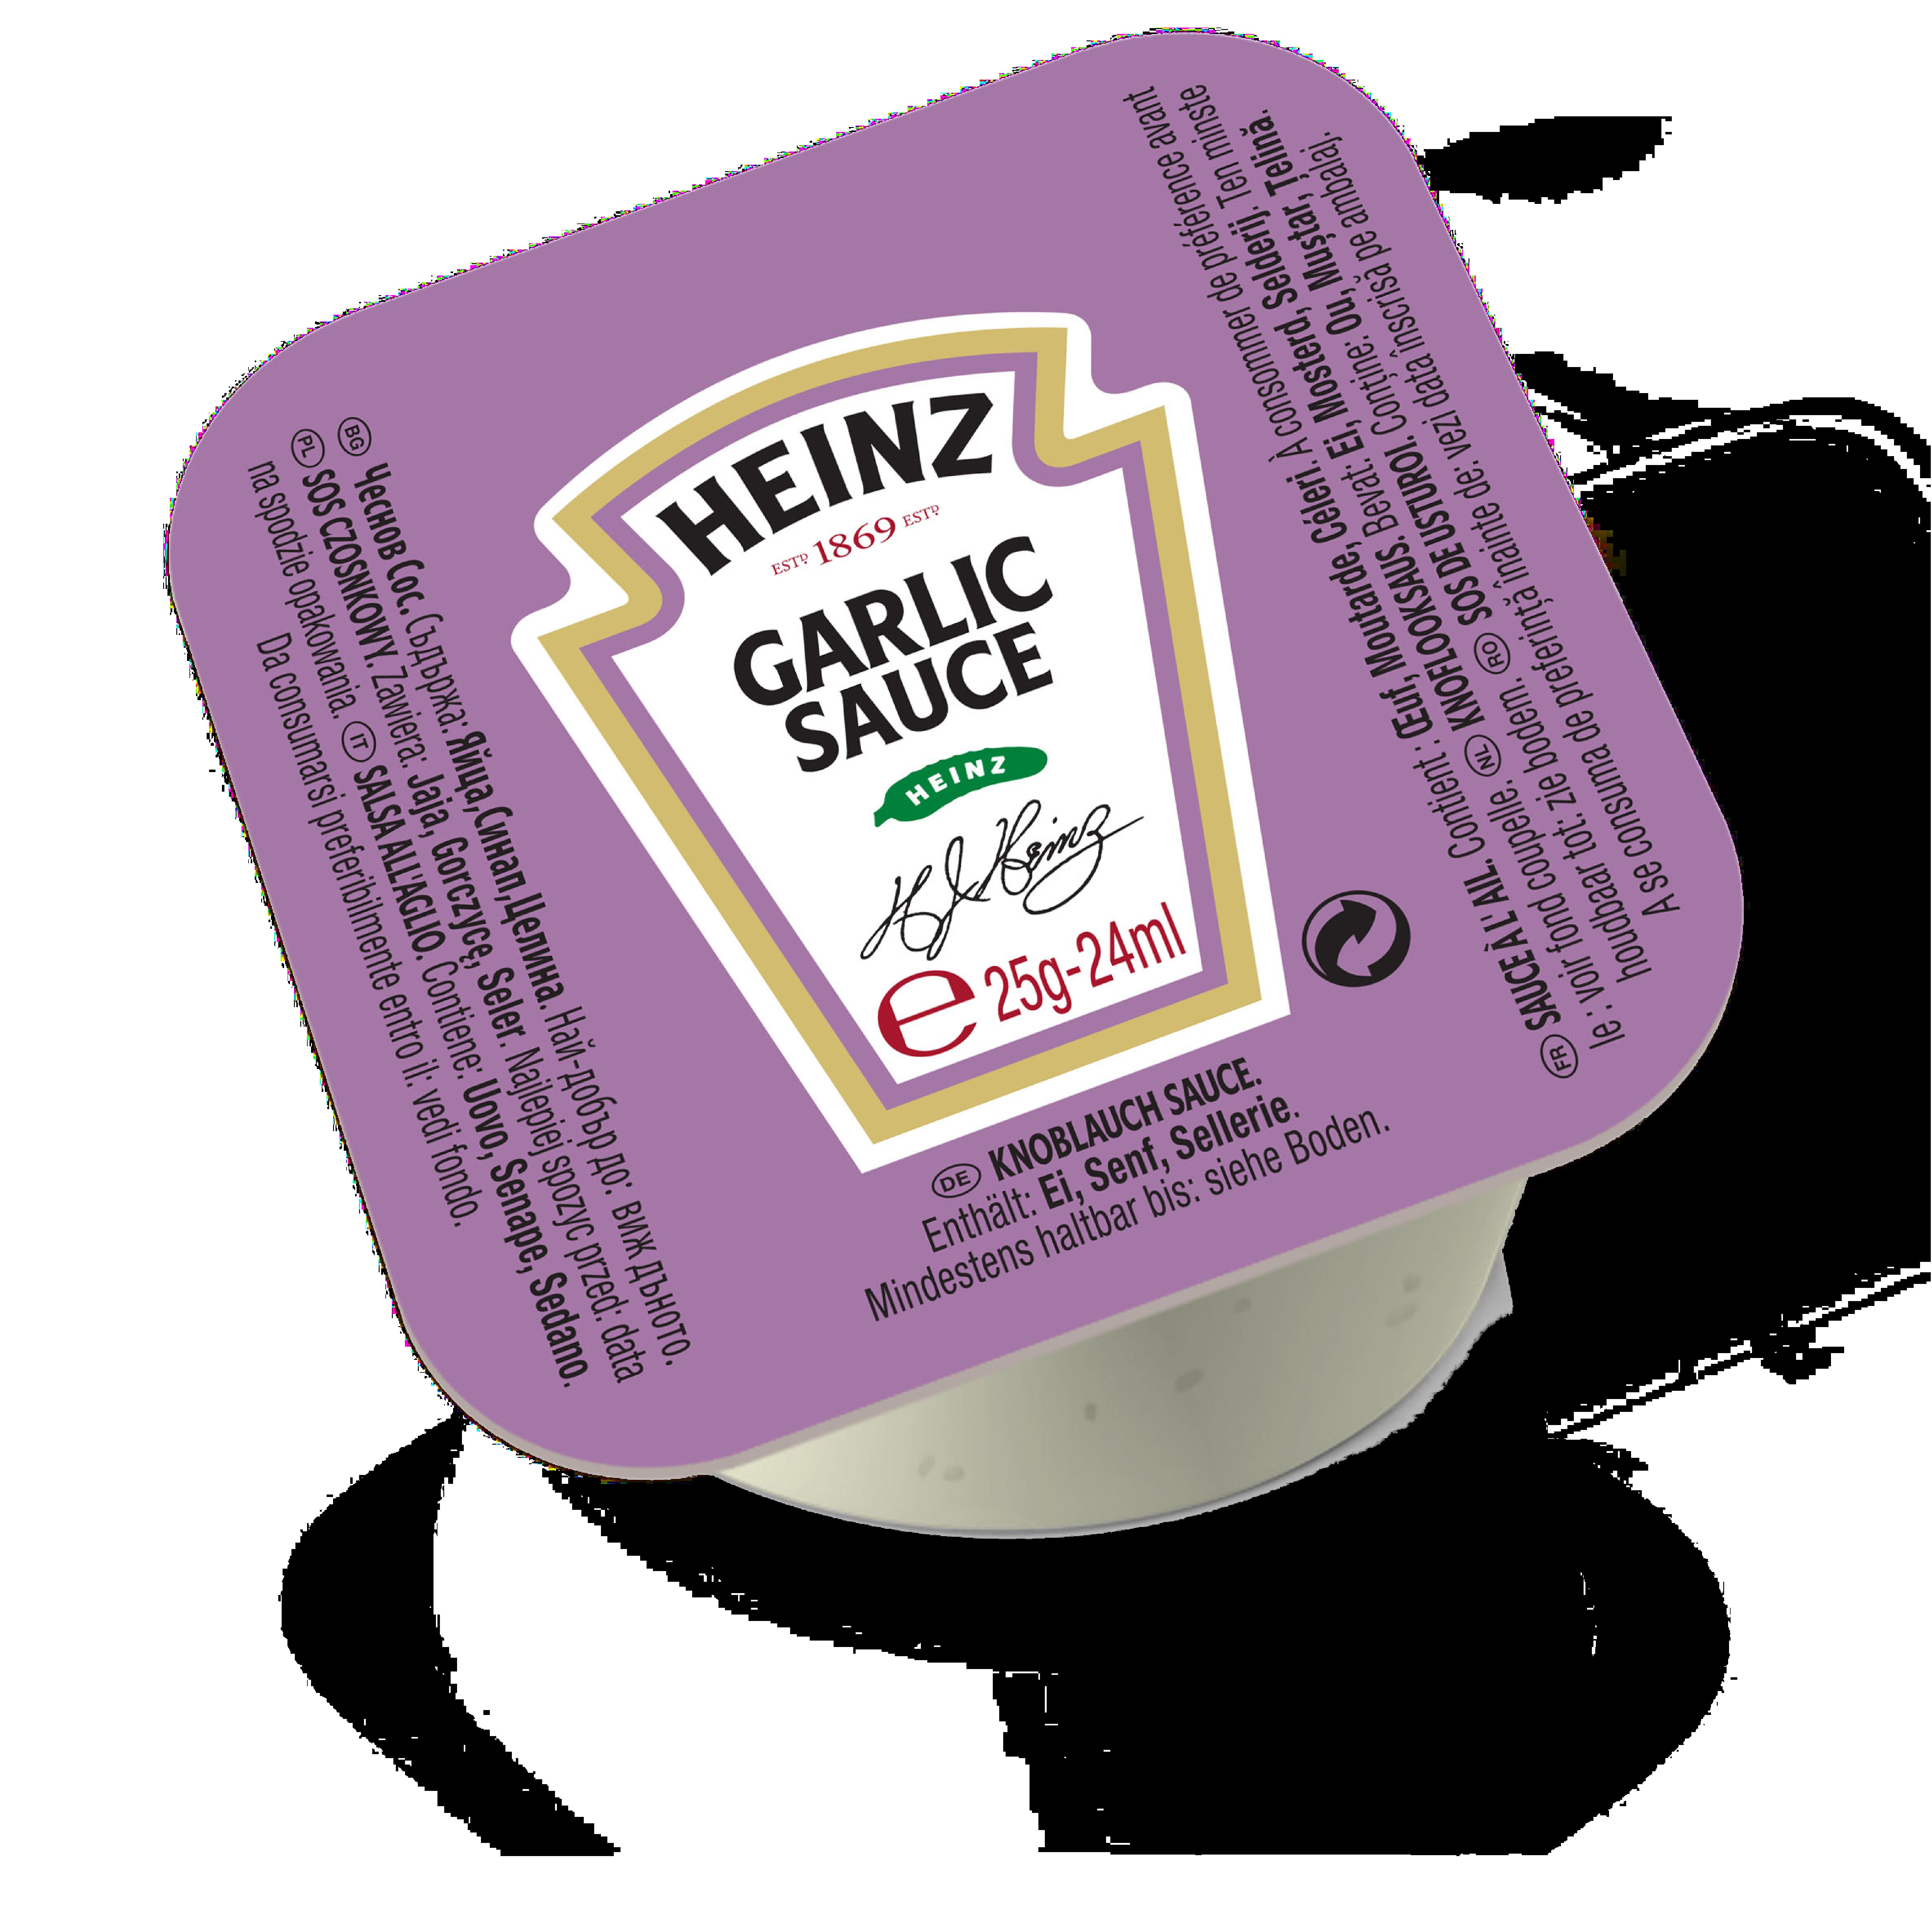 Heinz Garlic Sauce 25g Dip Pot image